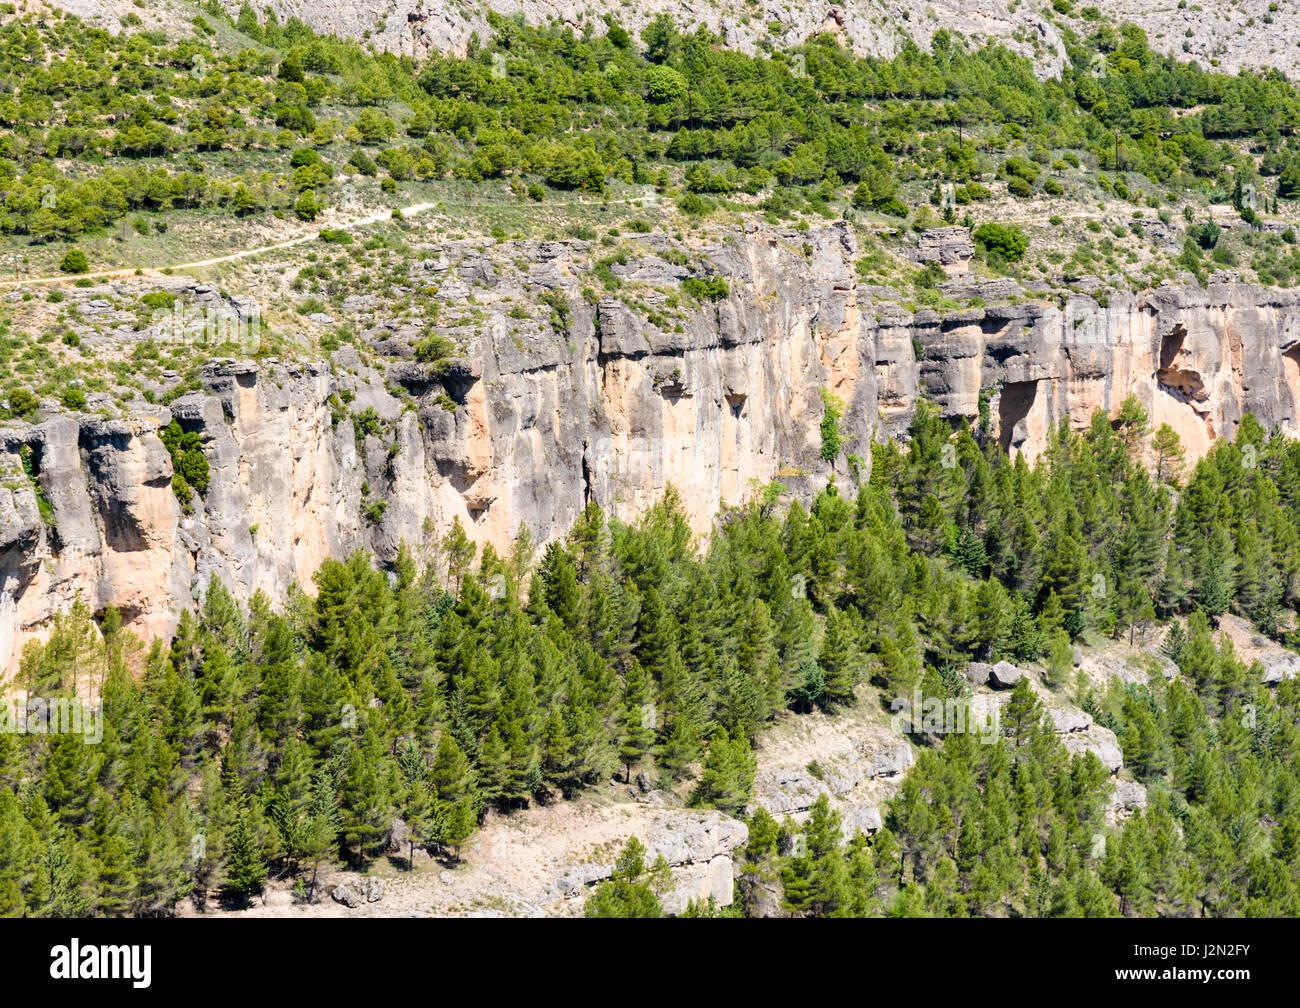 Karst topography forming the Jucar Gorge, Castilla La Mancha, Spain - Stock Image